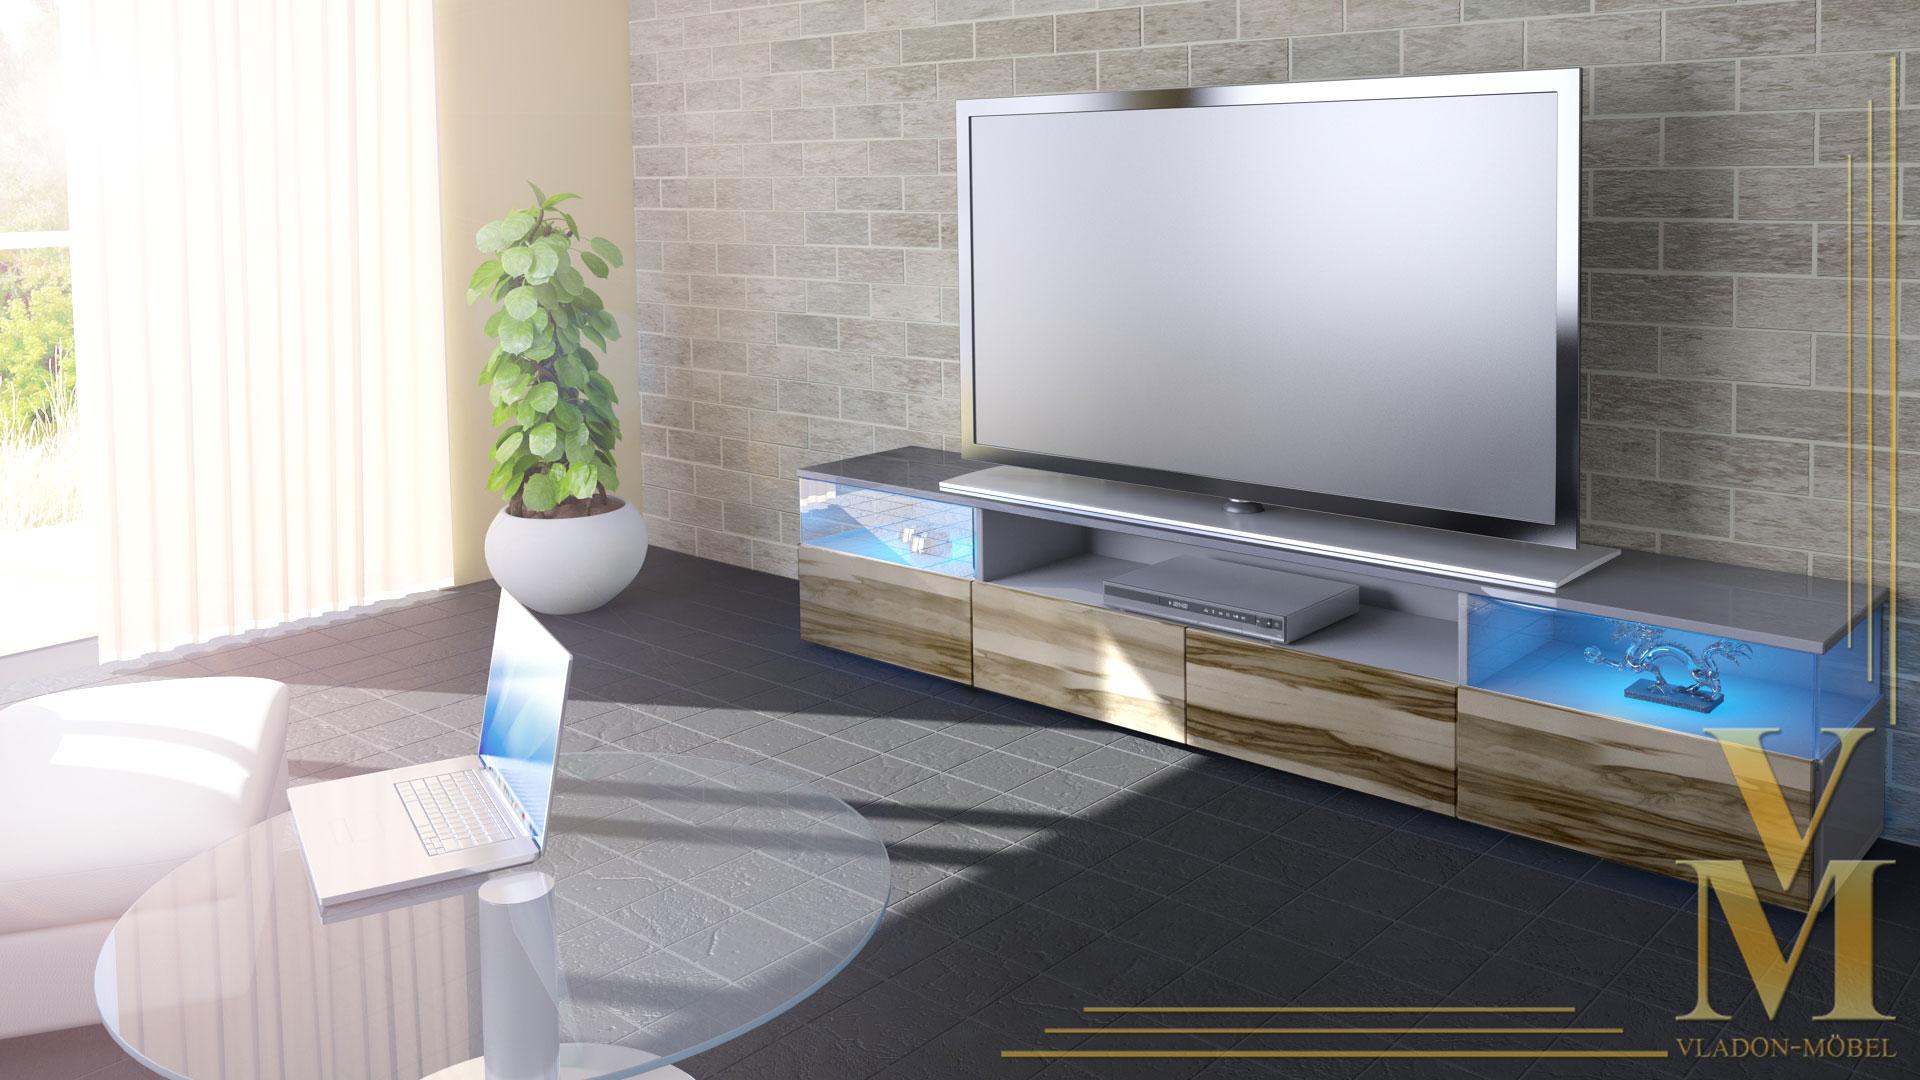 lowboard kommode tv board unterschrank almeria v2 grau hochglanz naturt ne ebay. Black Bedroom Furniture Sets. Home Design Ideas